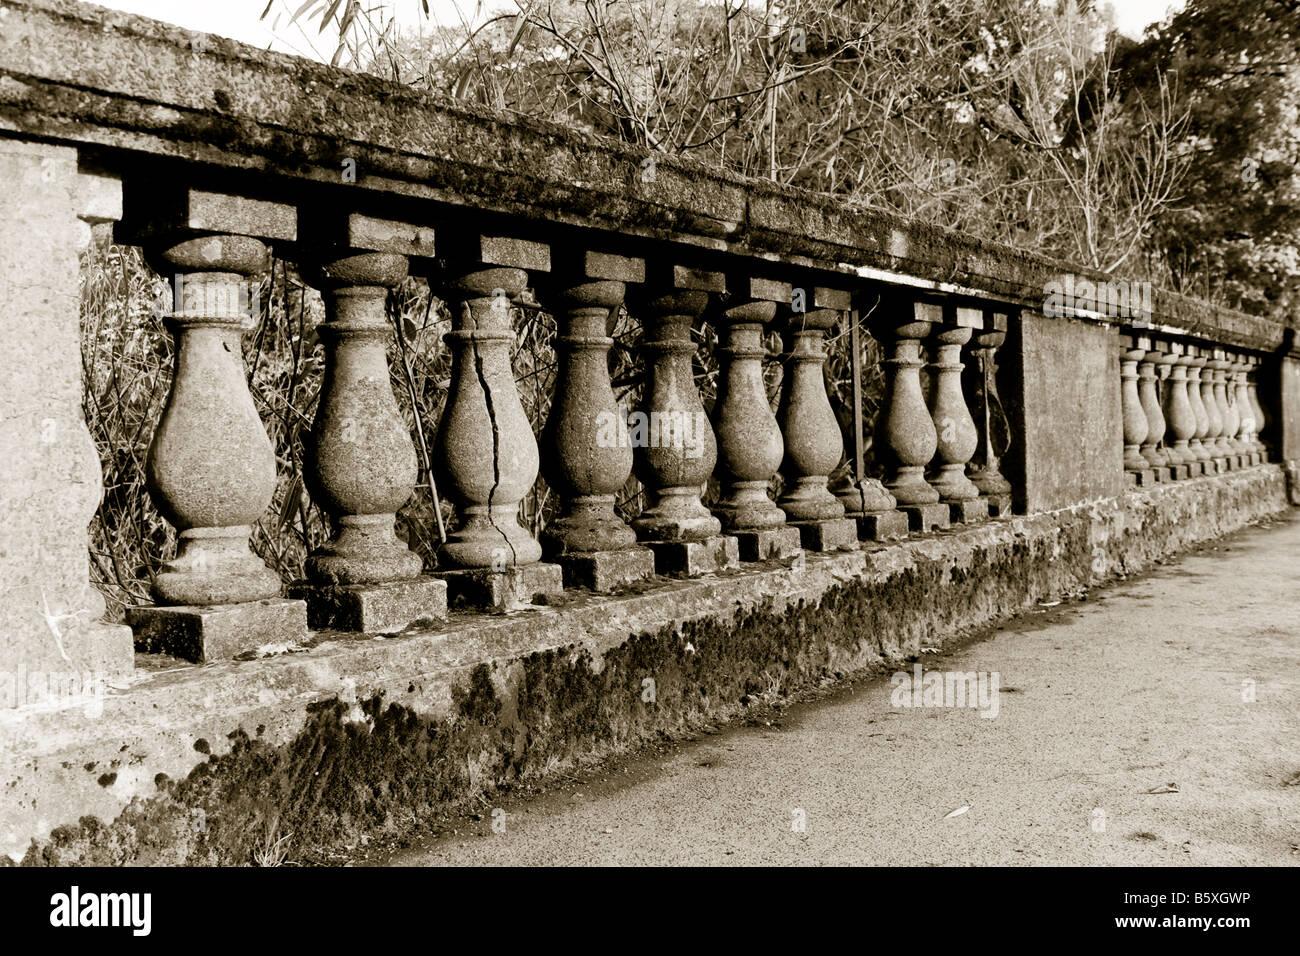 Old stone railings, Lymm Dam, Lymm, Warrington, Cheshire, England - Stock Image